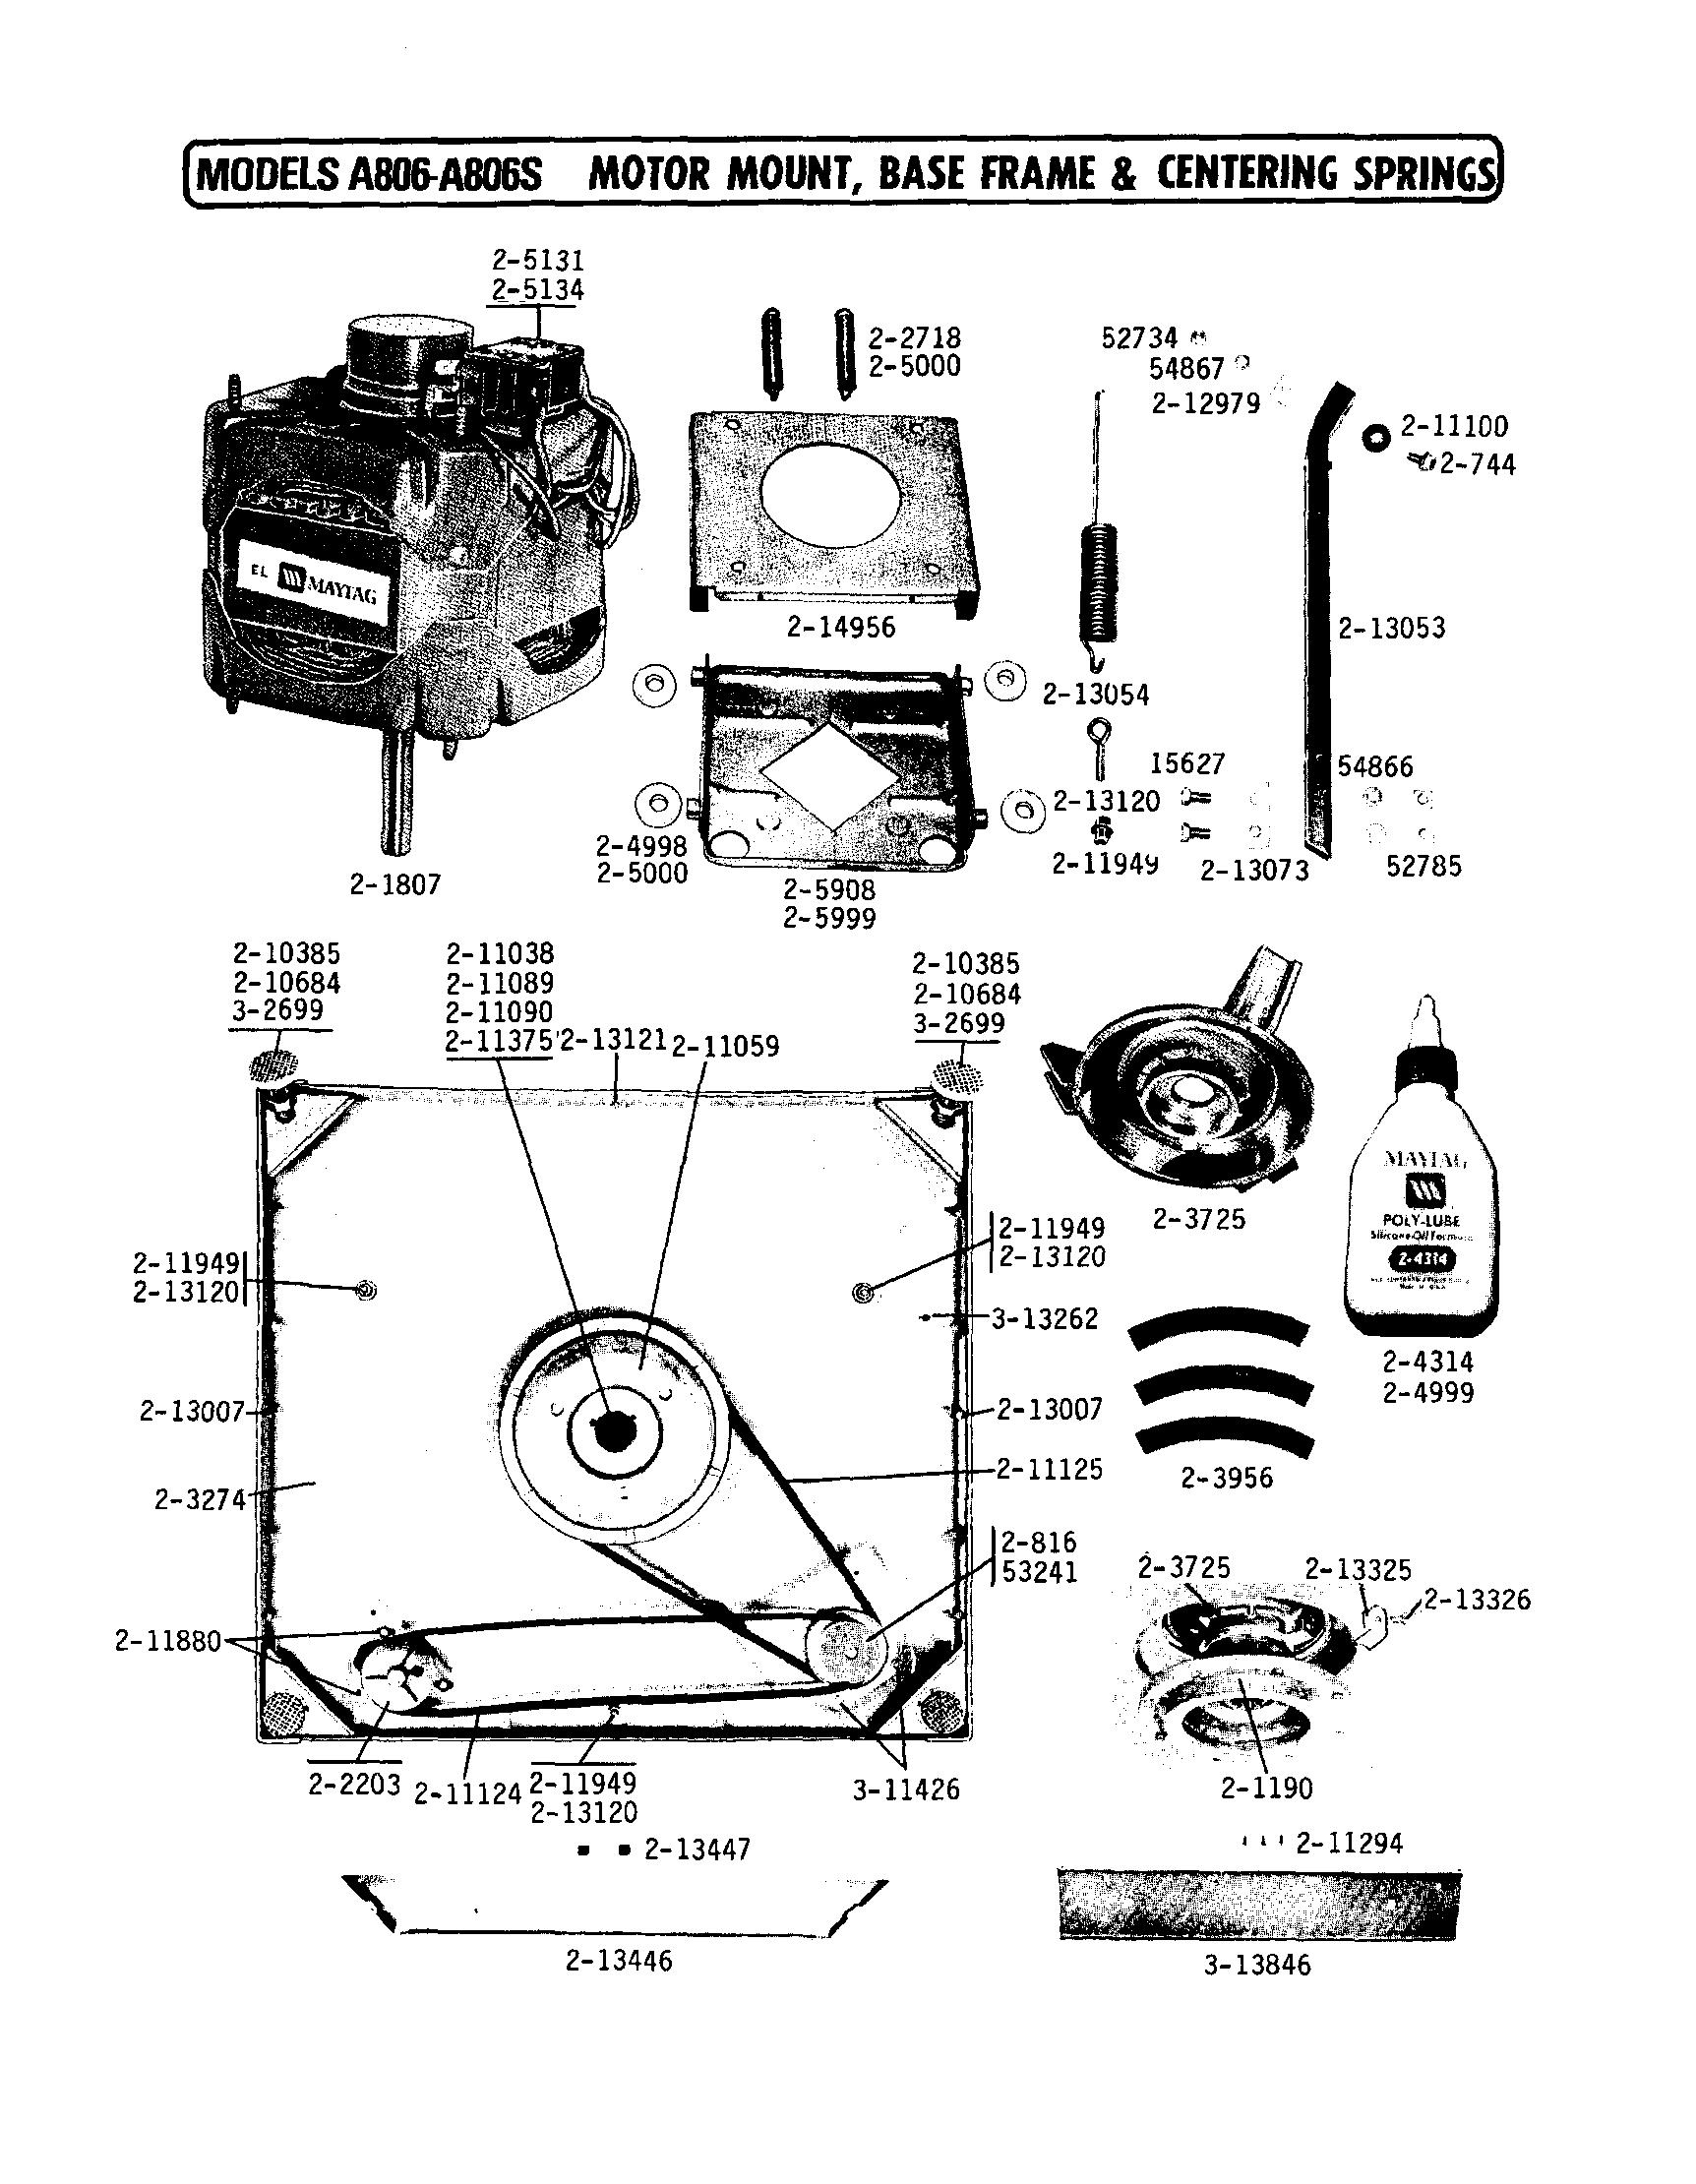 Baldor Motor Parts Diagram : baldor, motor, parts, diagram, Maytag, Timer, Stove, Clocks, Appliance, Timers